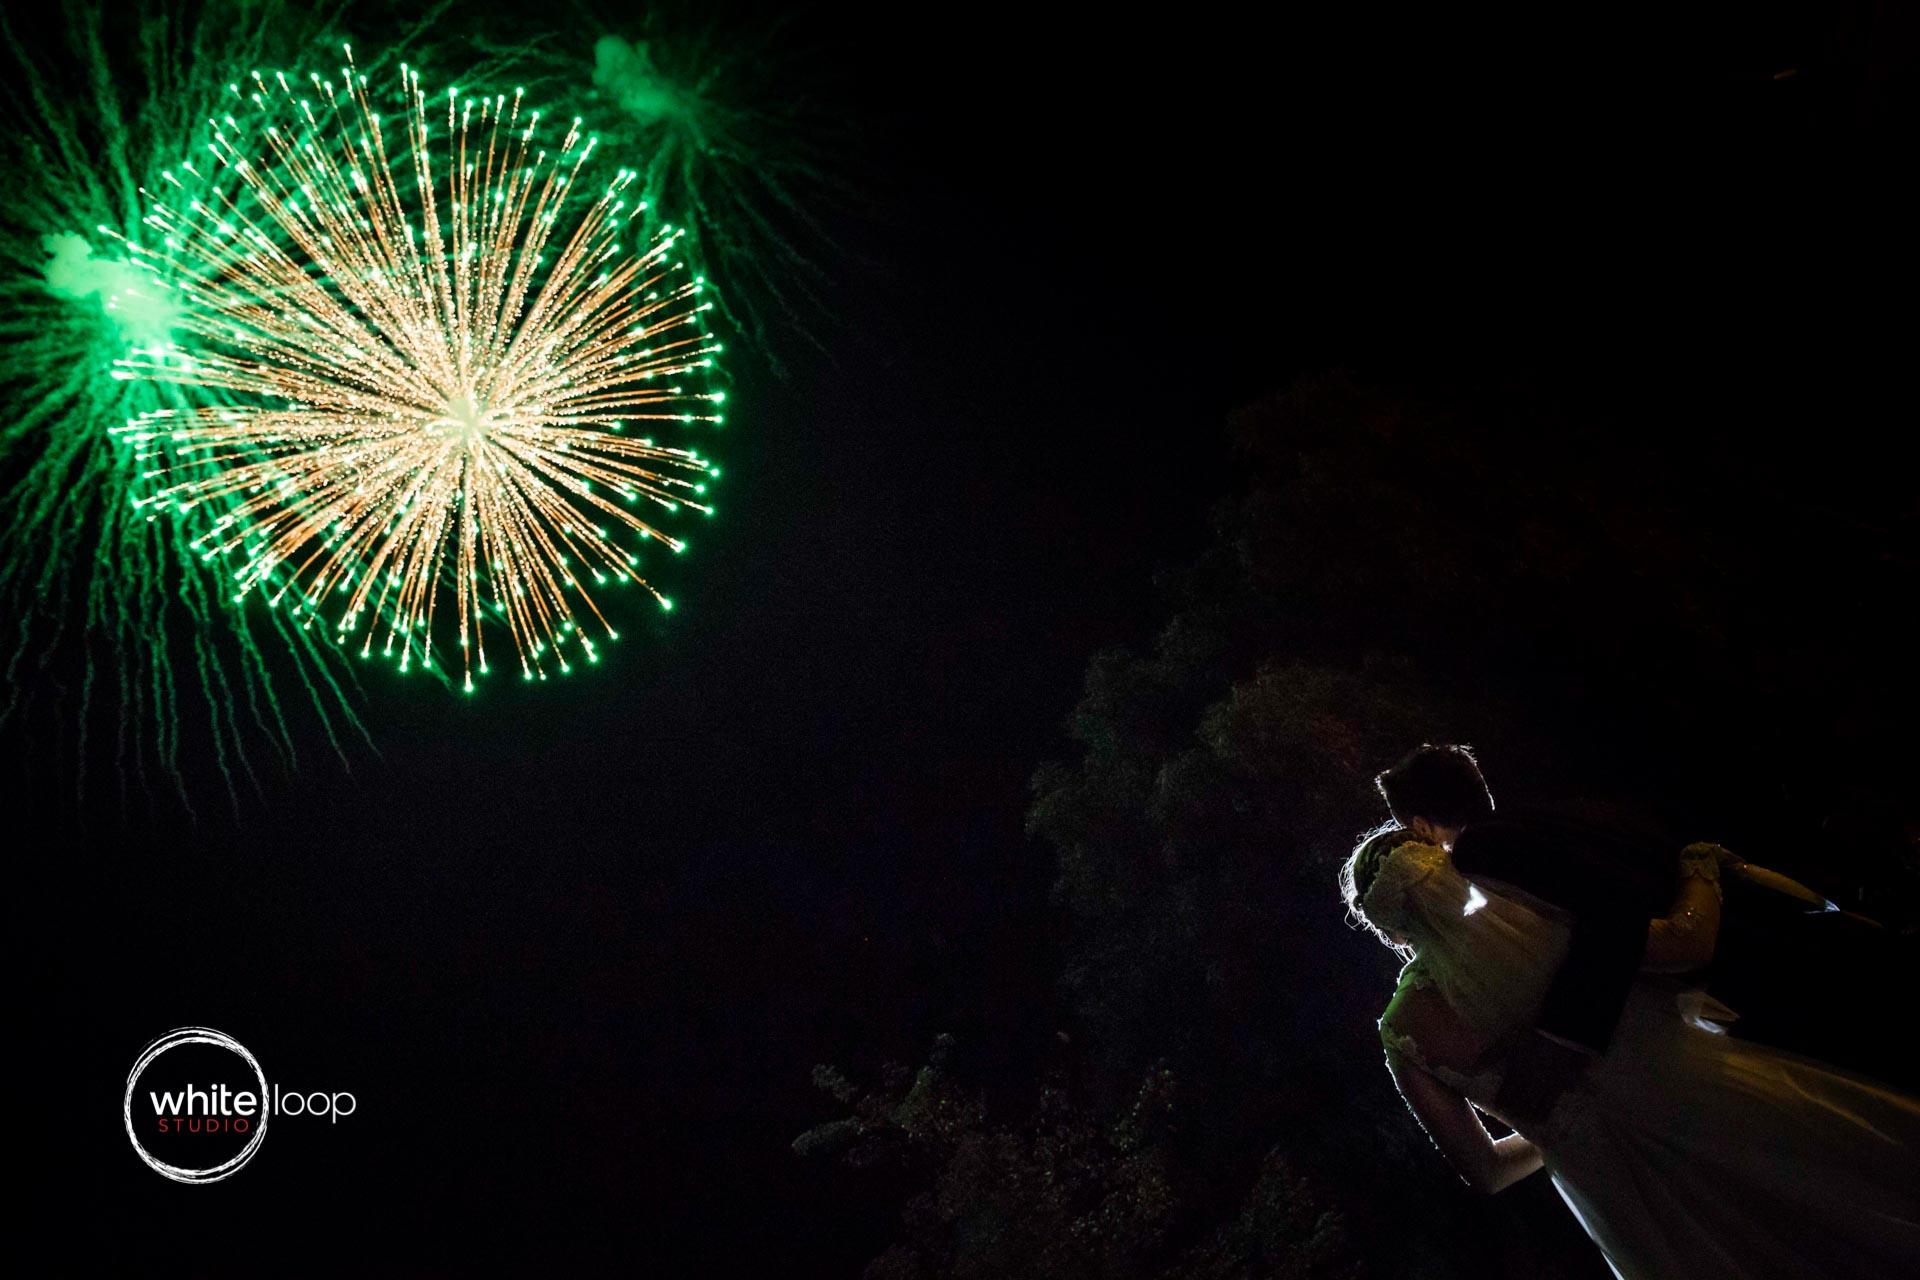 Andrea and Roberto, Fireworks, Hacienda la Magdalena, Guadalajara, Mexico